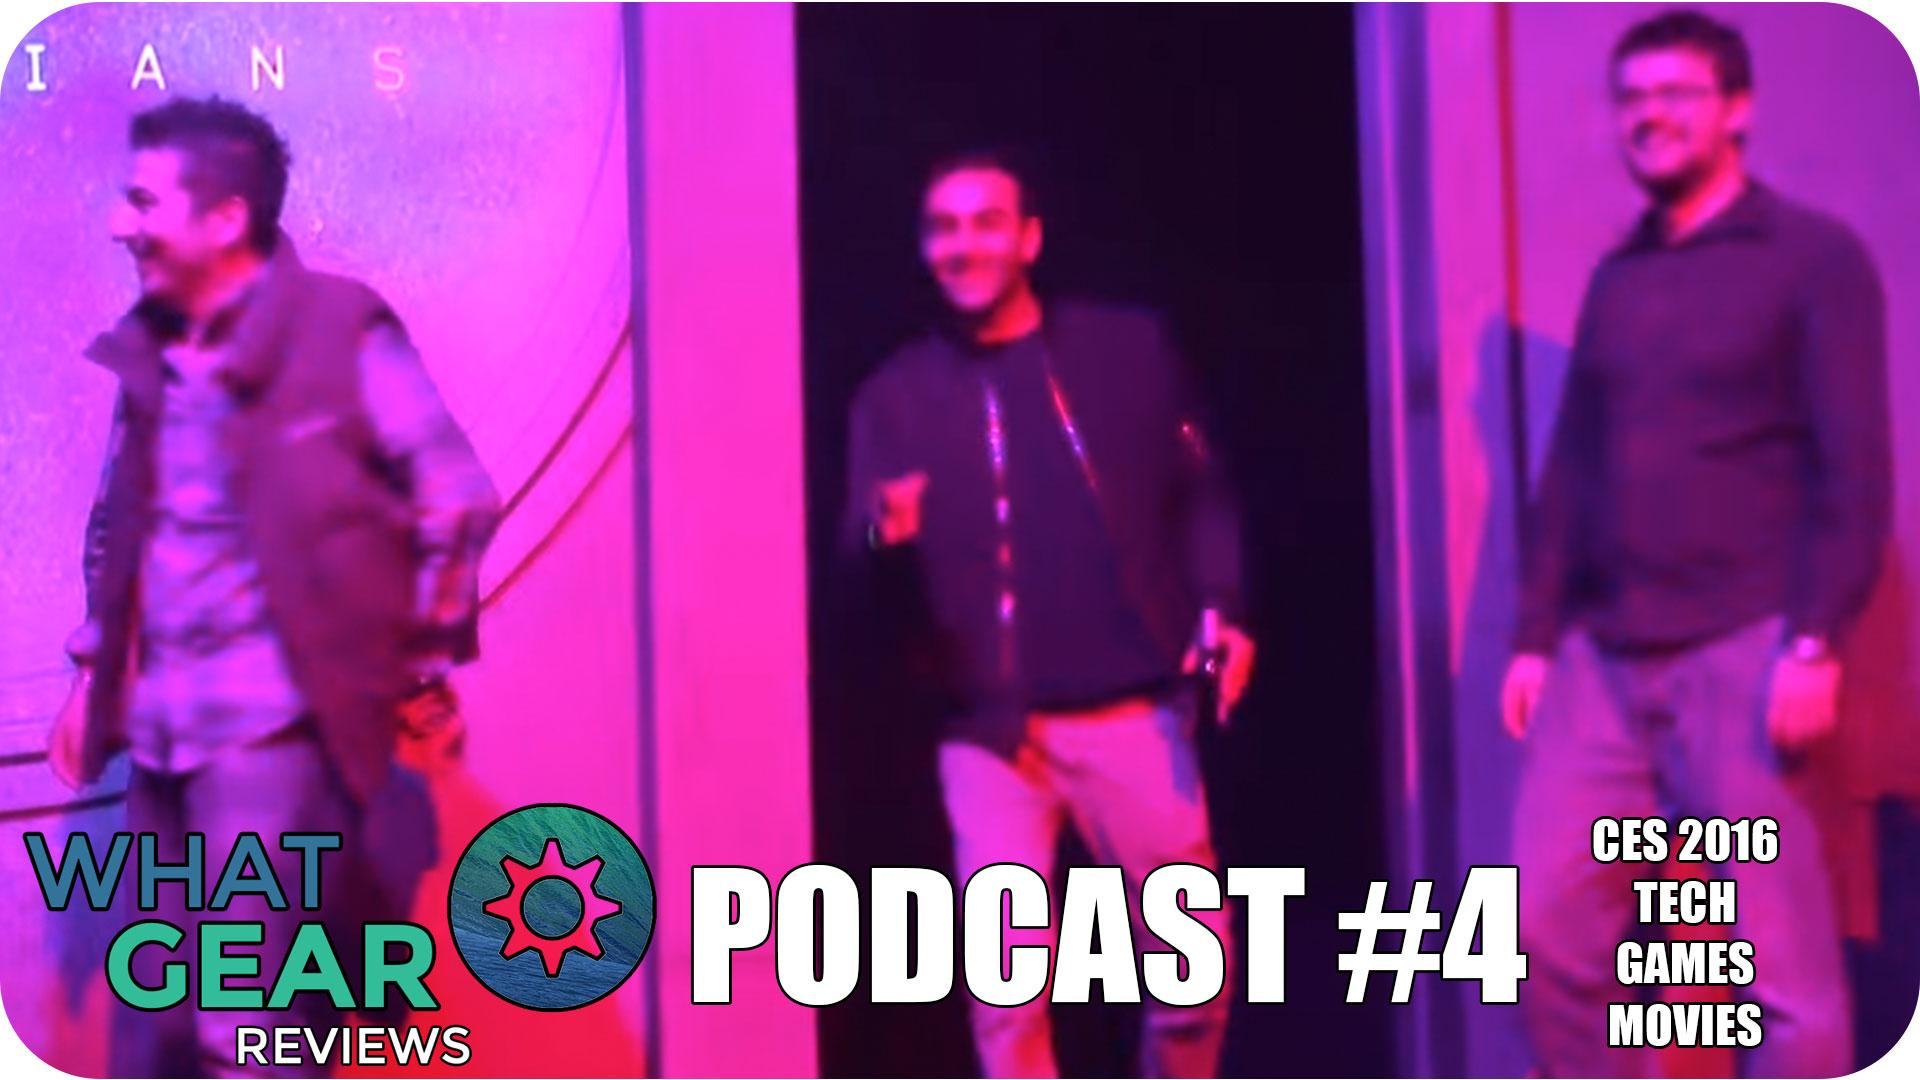 whatGear_podcast_4